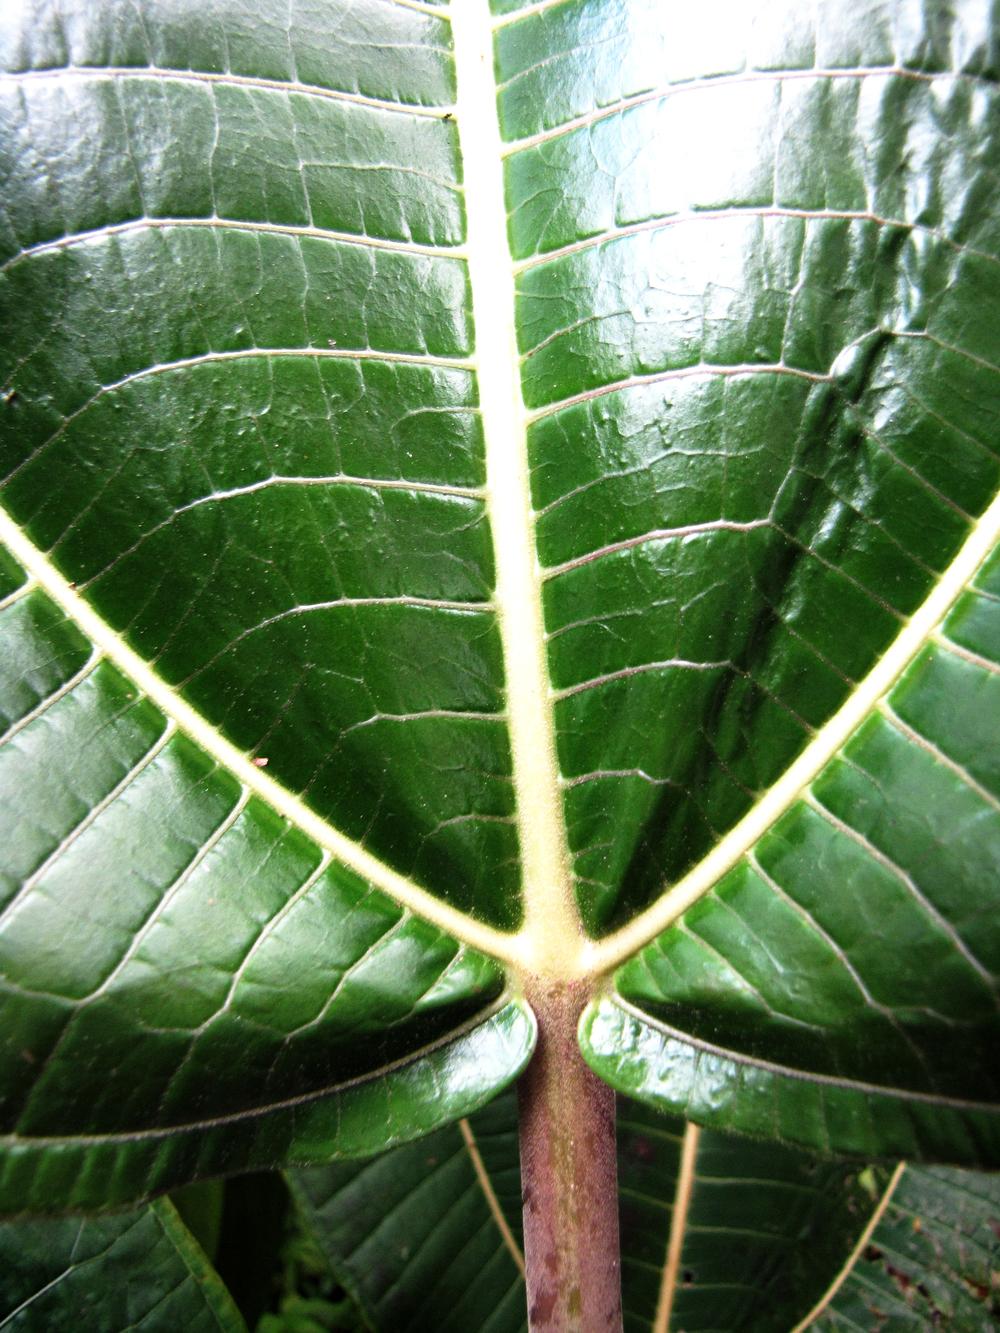 Photo of Melostomataceae leaf